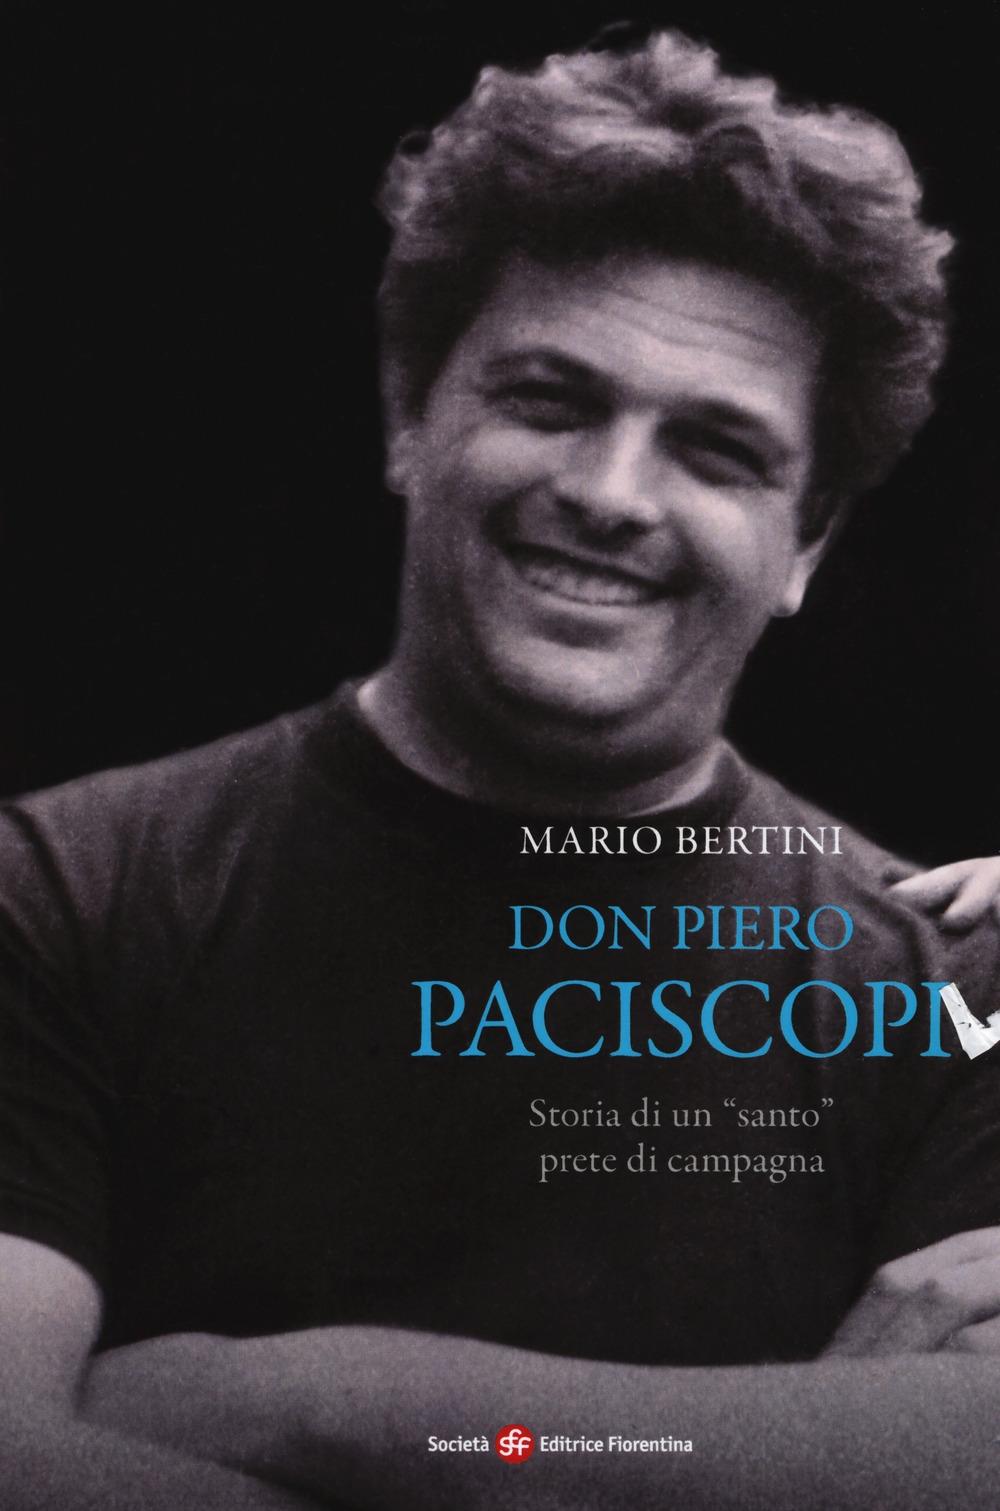 Don Piero Paciscopi